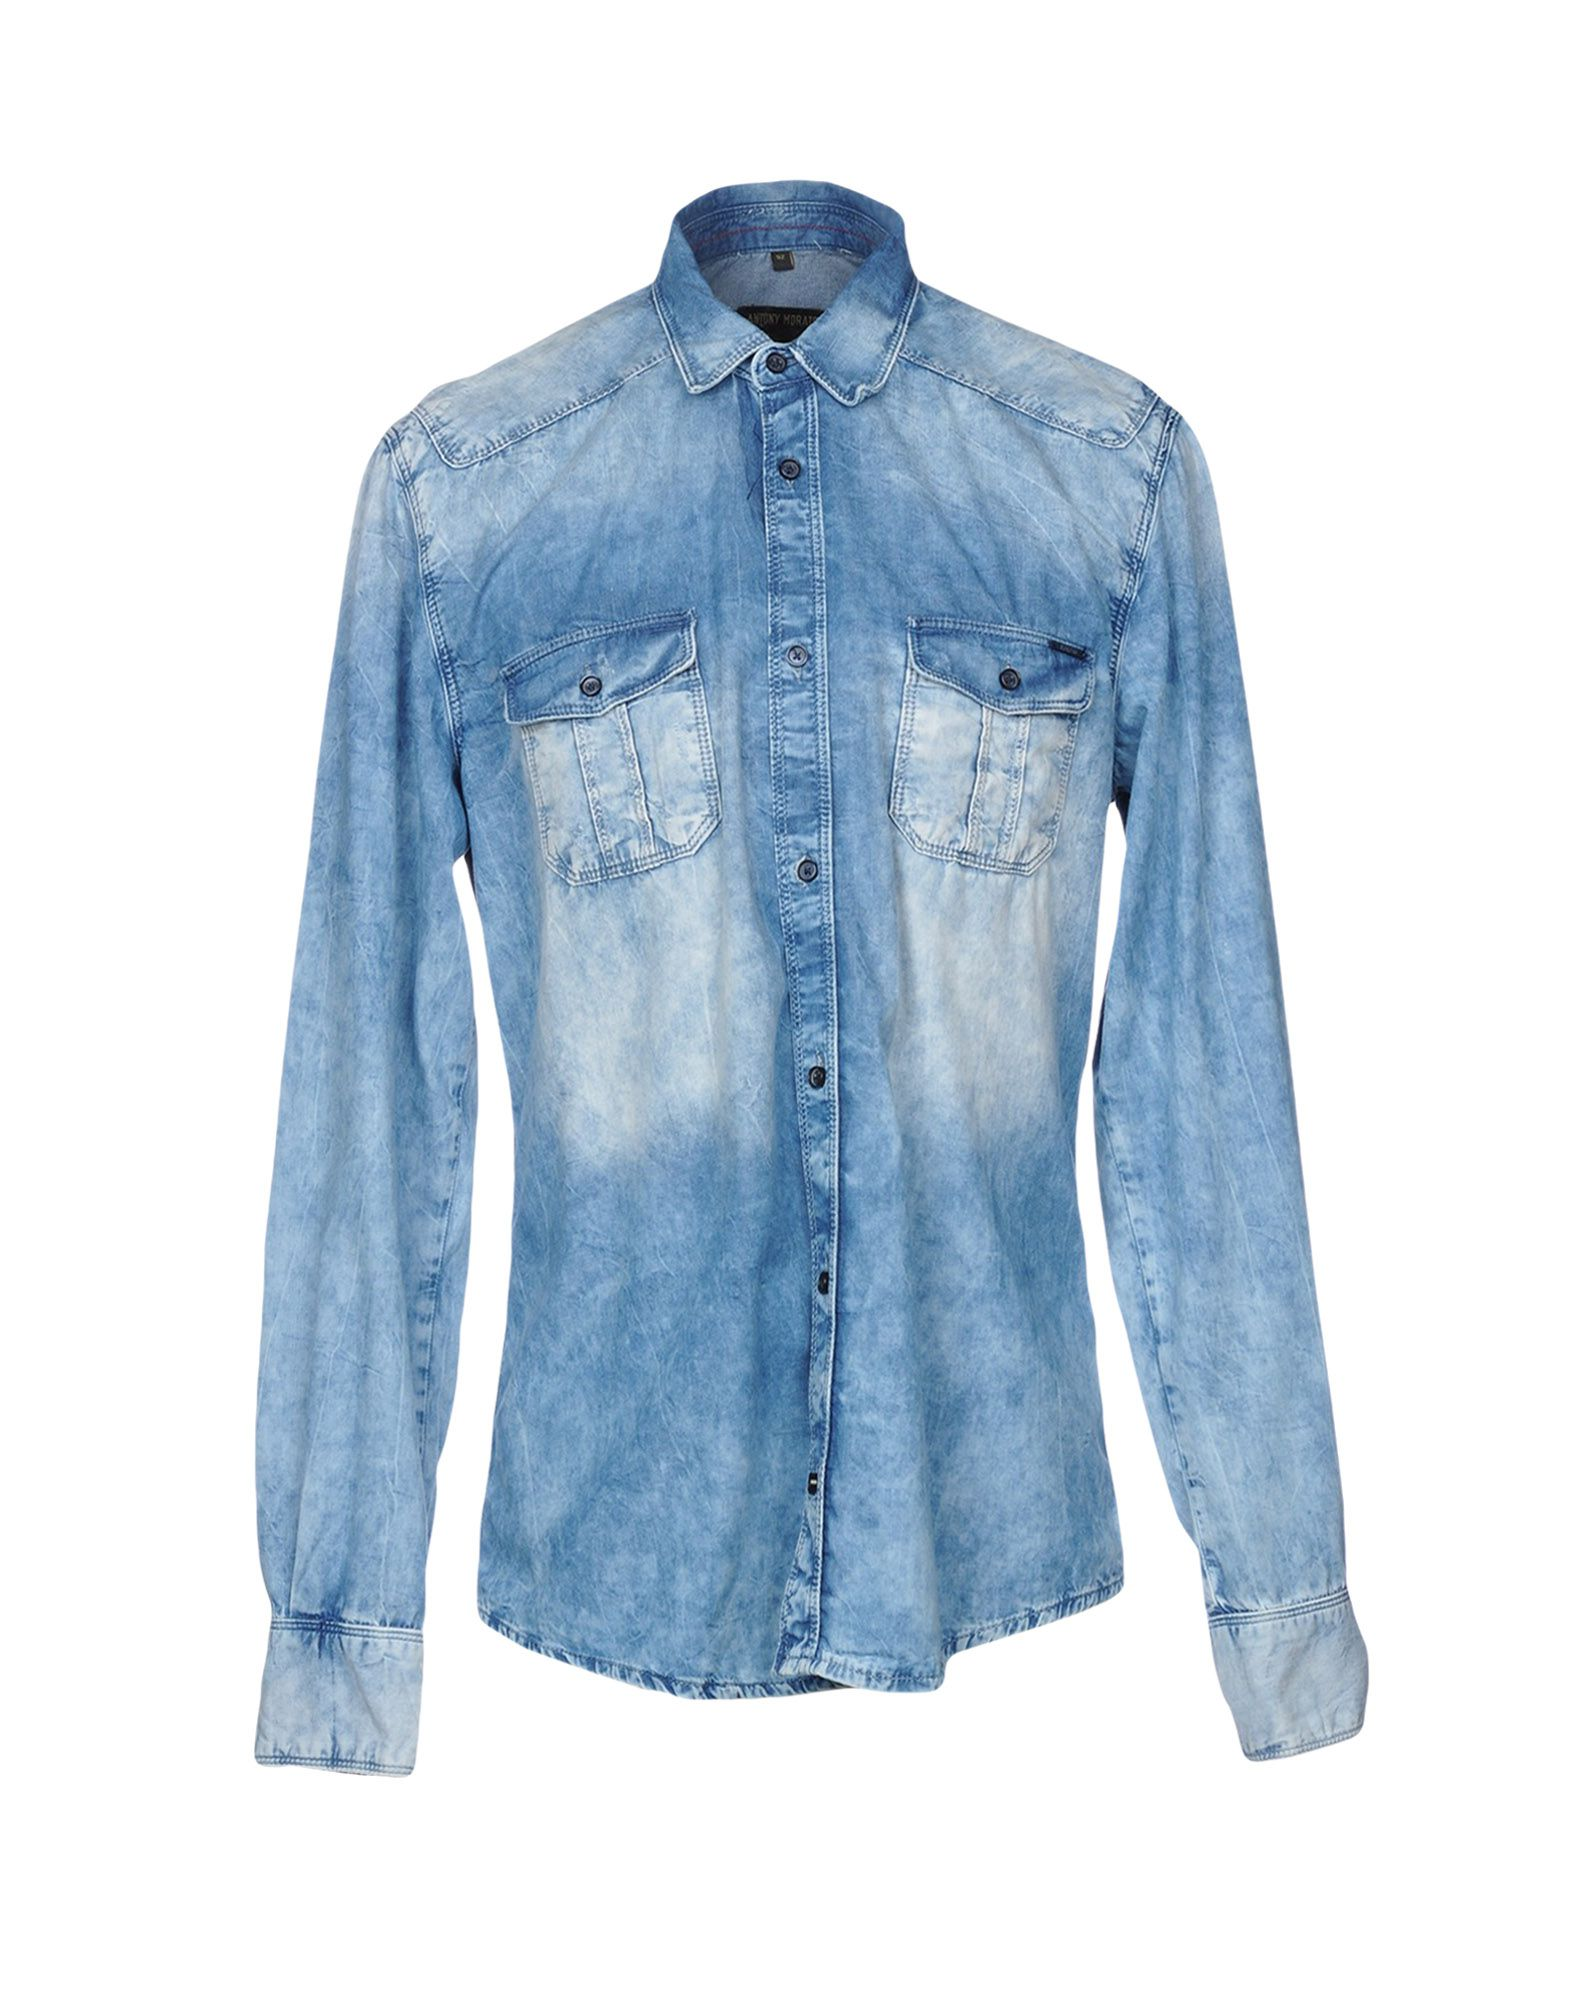 ANTONY MORATO Джинсовая рубашка antony morato джинсовая рубашка